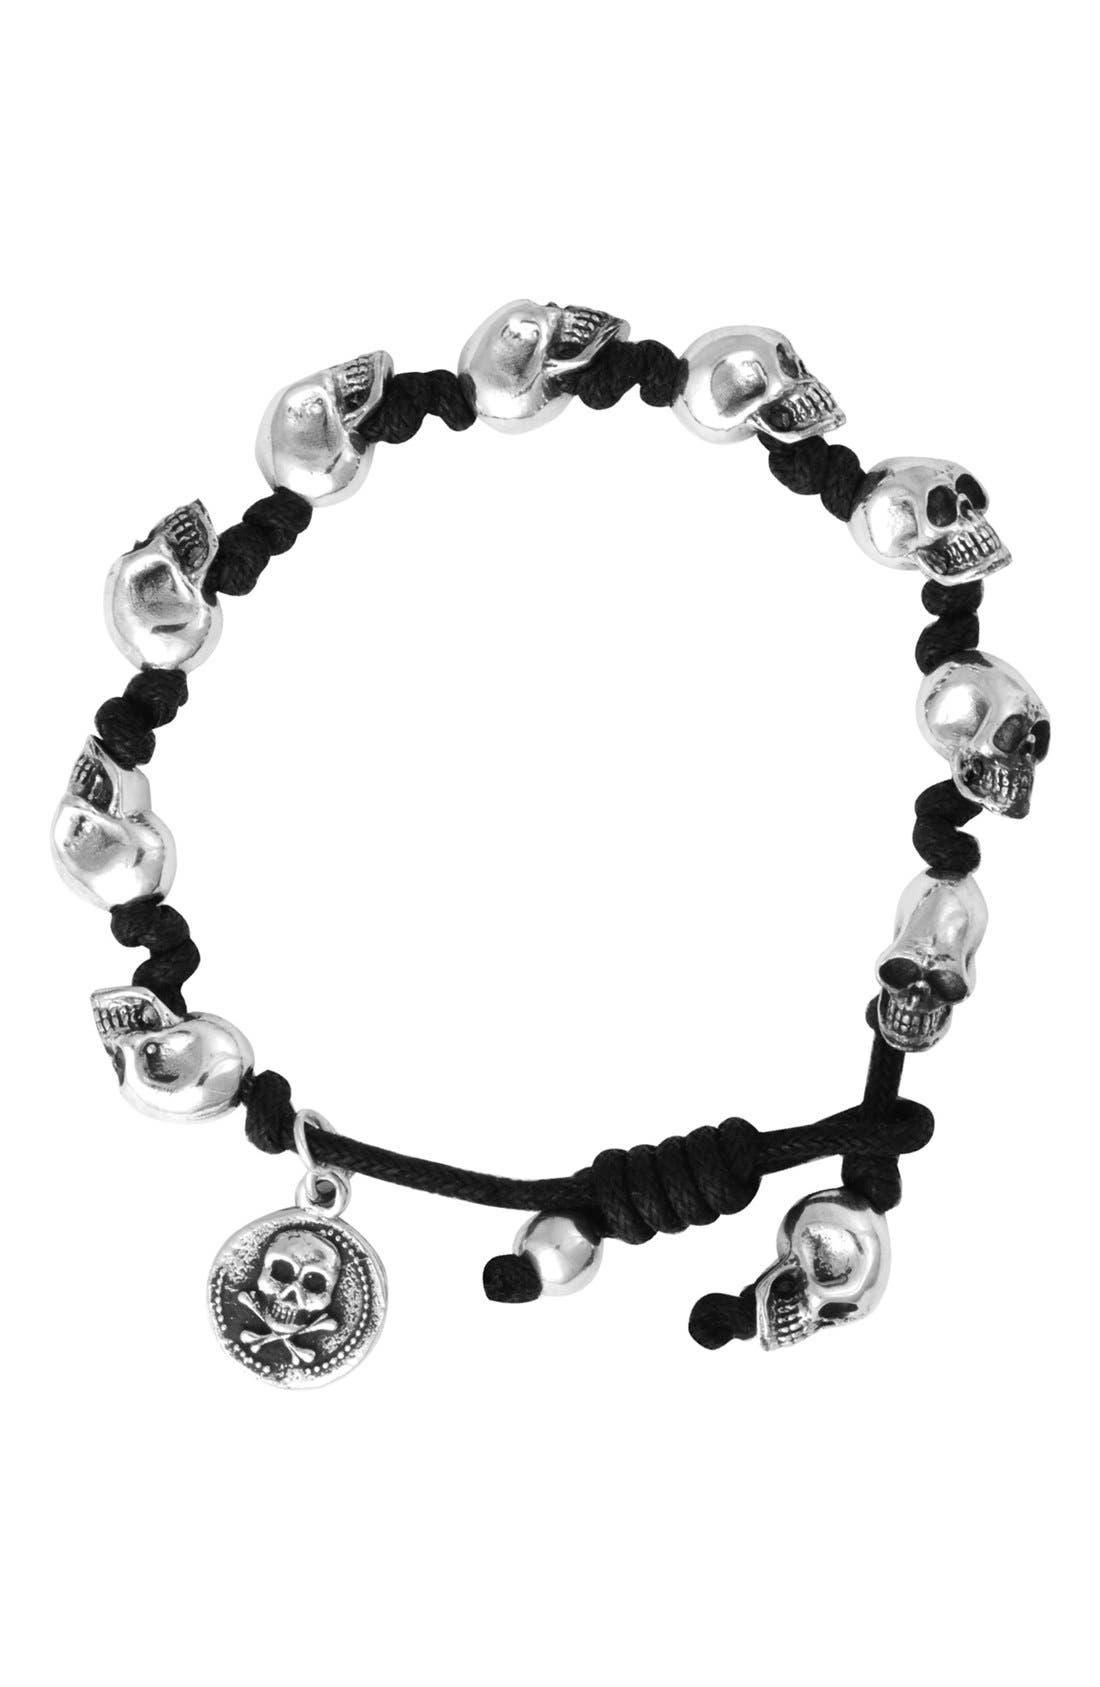 Skull Bead Bracelet,                         Main,                         color, Silver